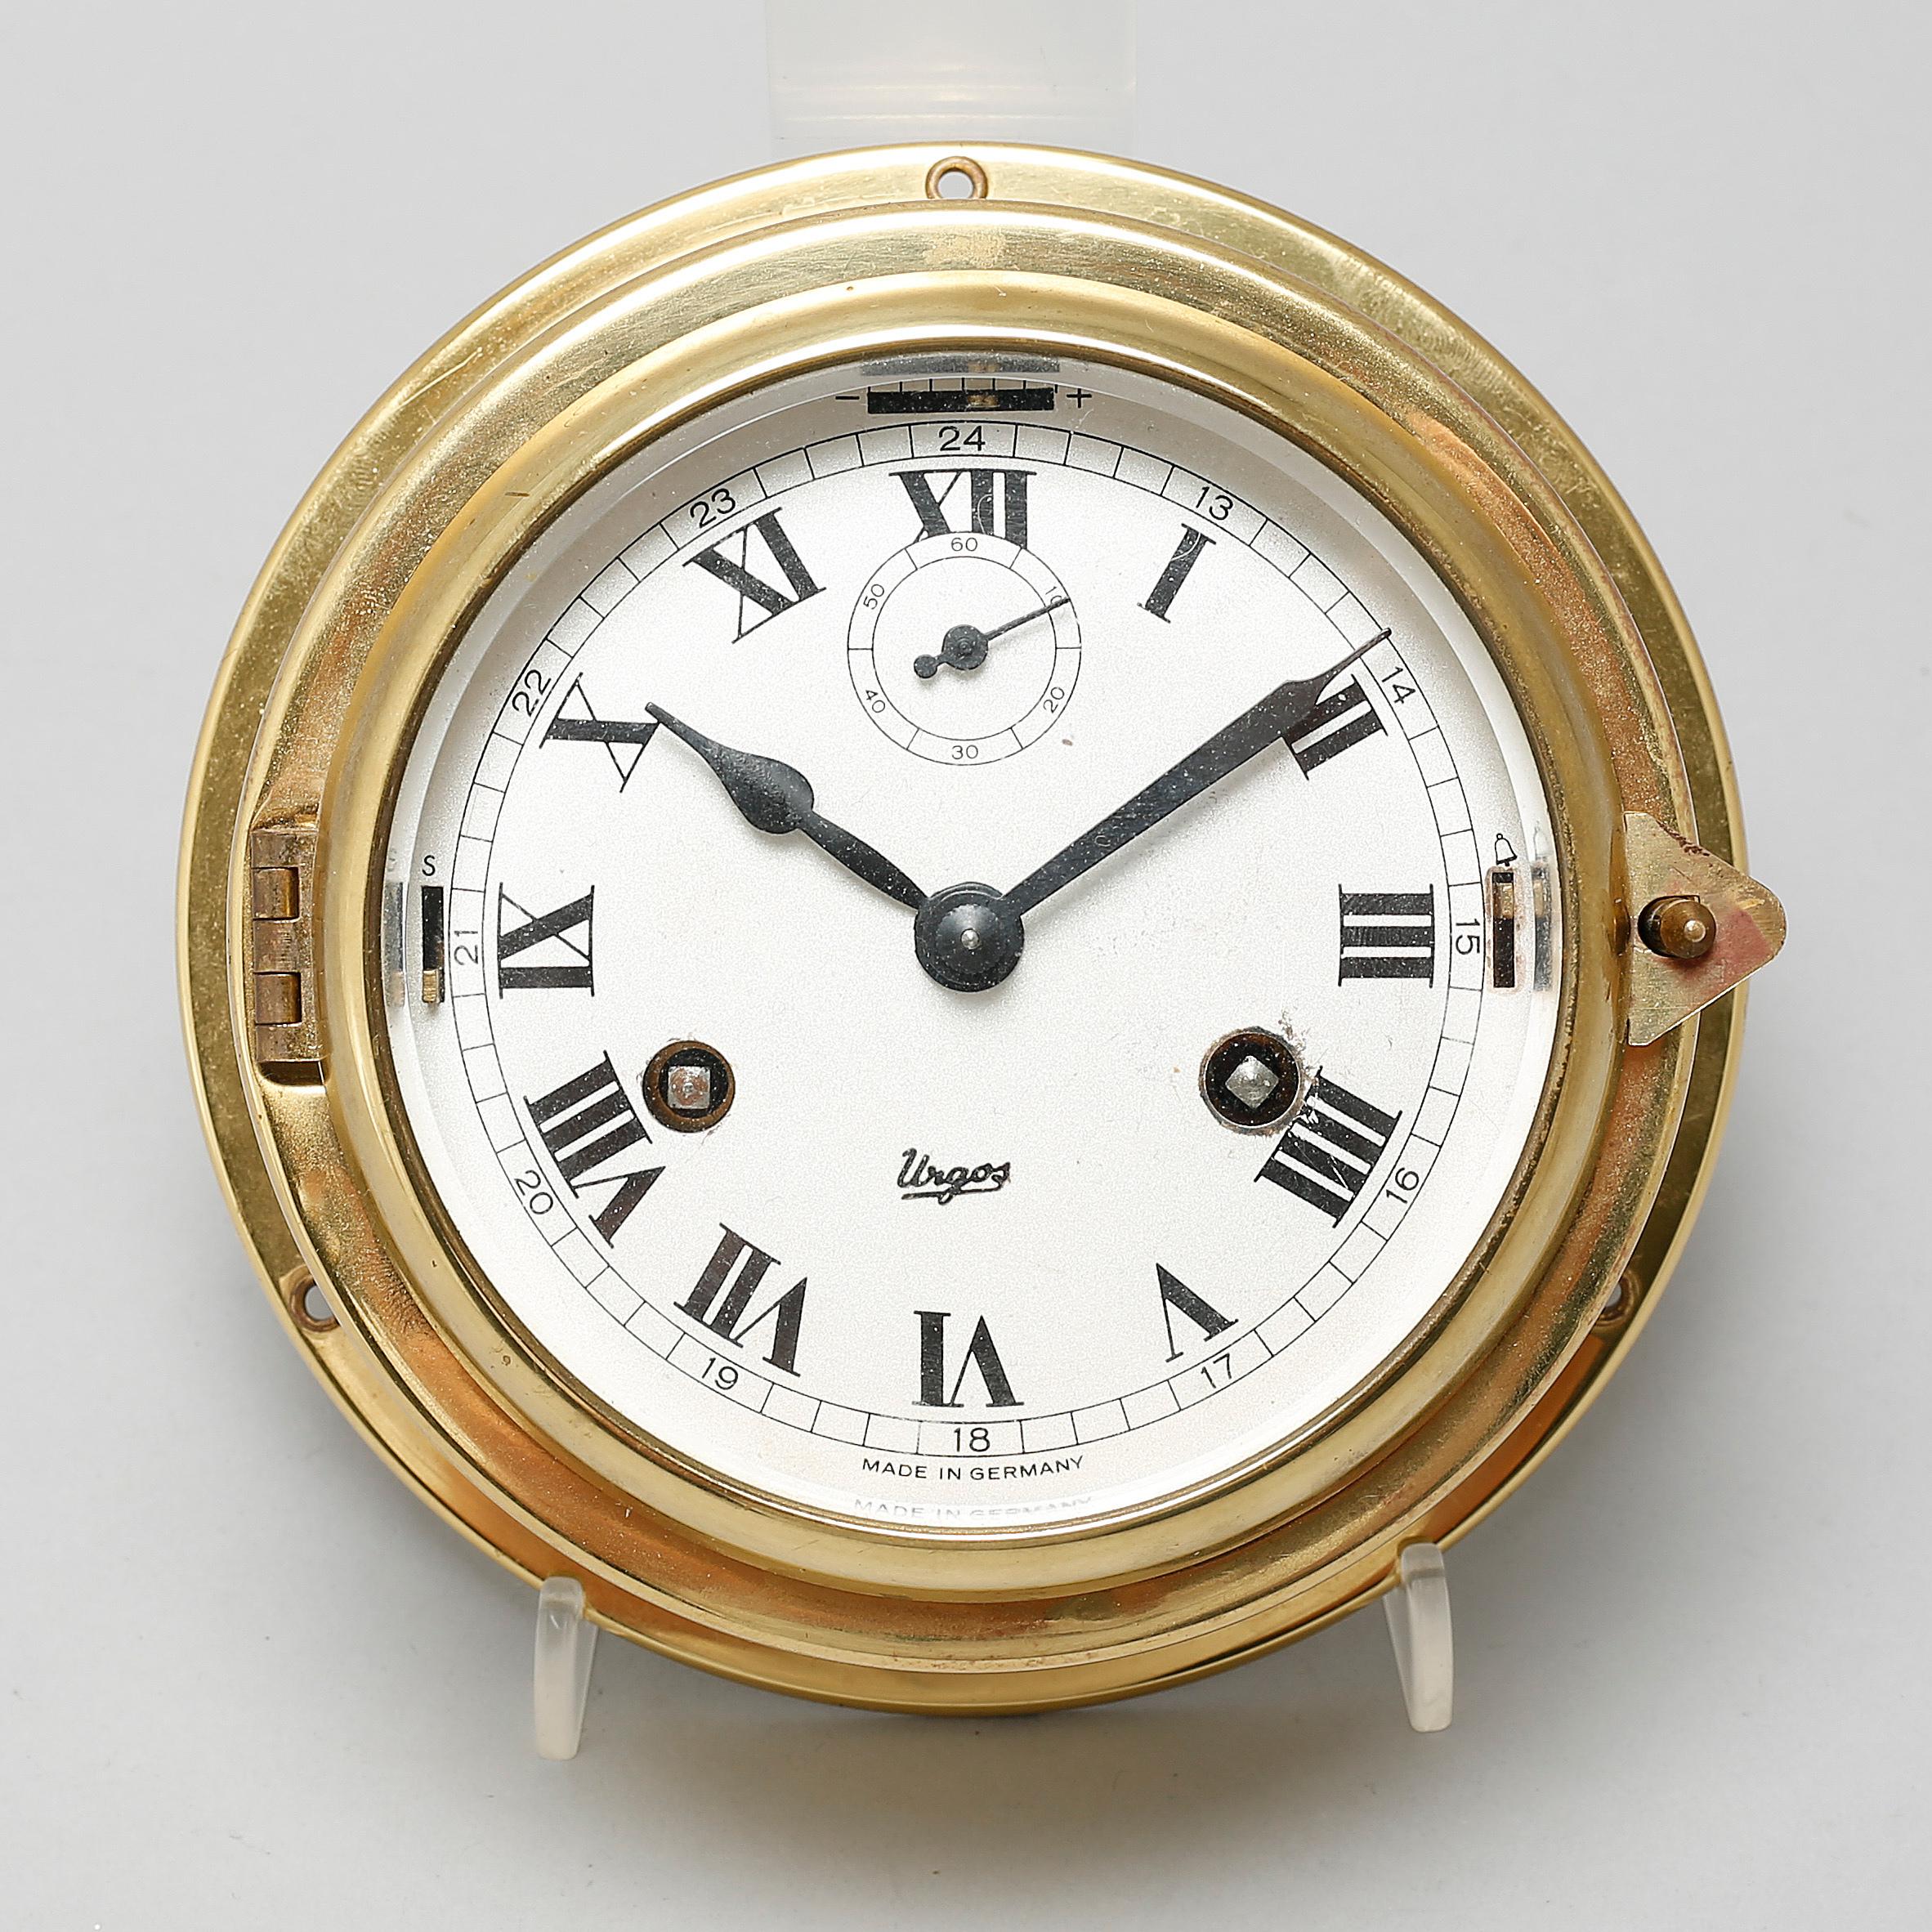 A ships clock from urgos in germany 20th century bukowskis 10662463 bukobject amipublicfo Choice Image